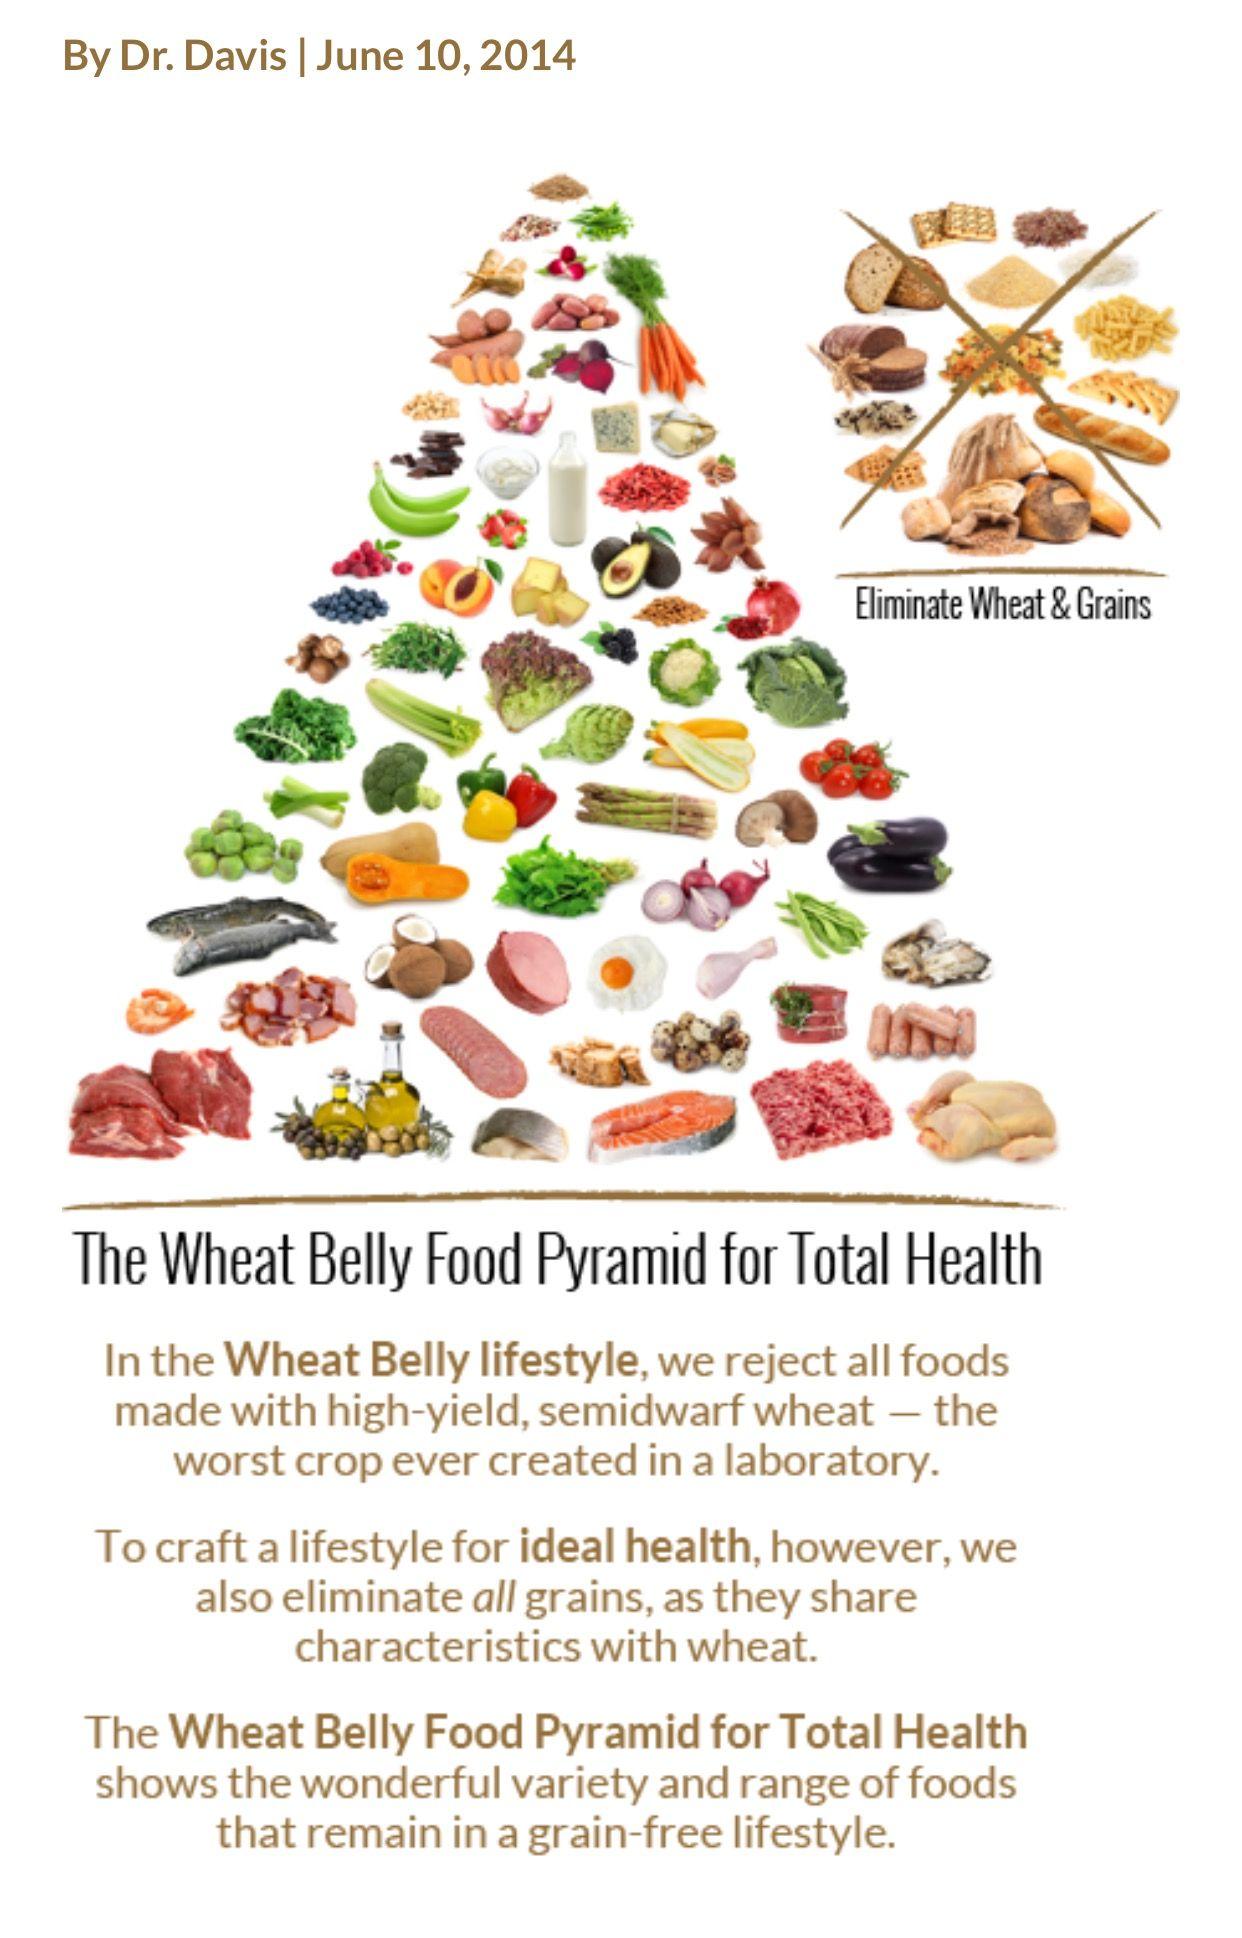 Pin by Robin McDonald on Wheat Belly Diet (Gluten Free) | Pinterest ...